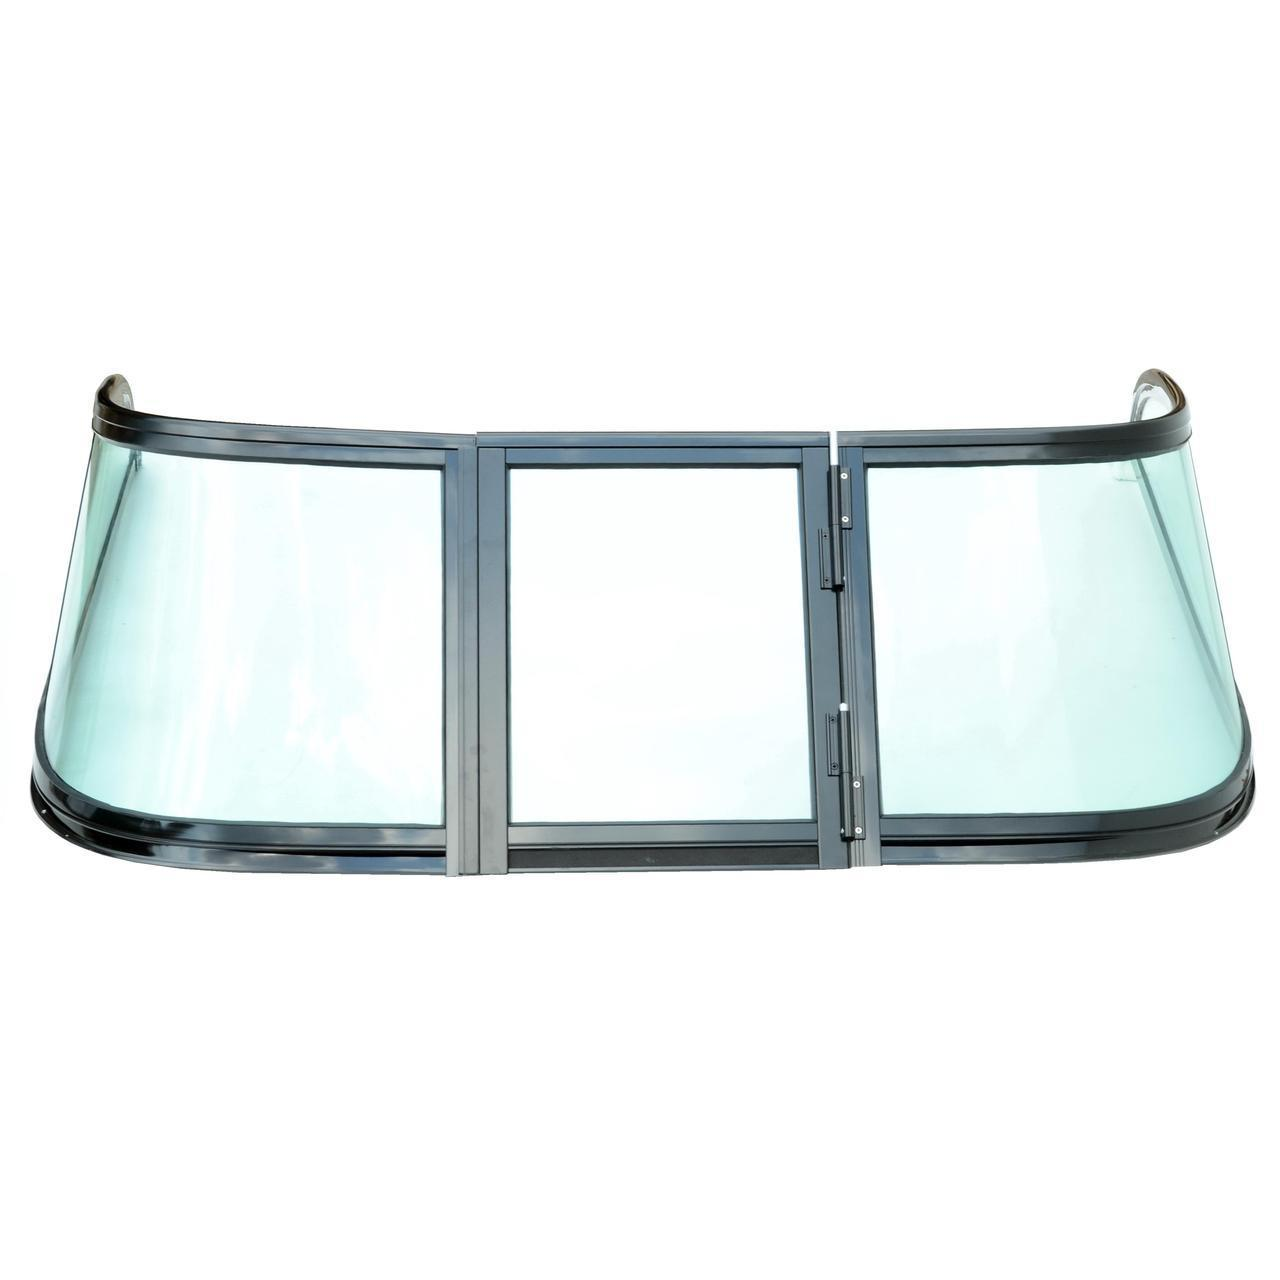 Ветровое стекло для лодки GALA Ob3